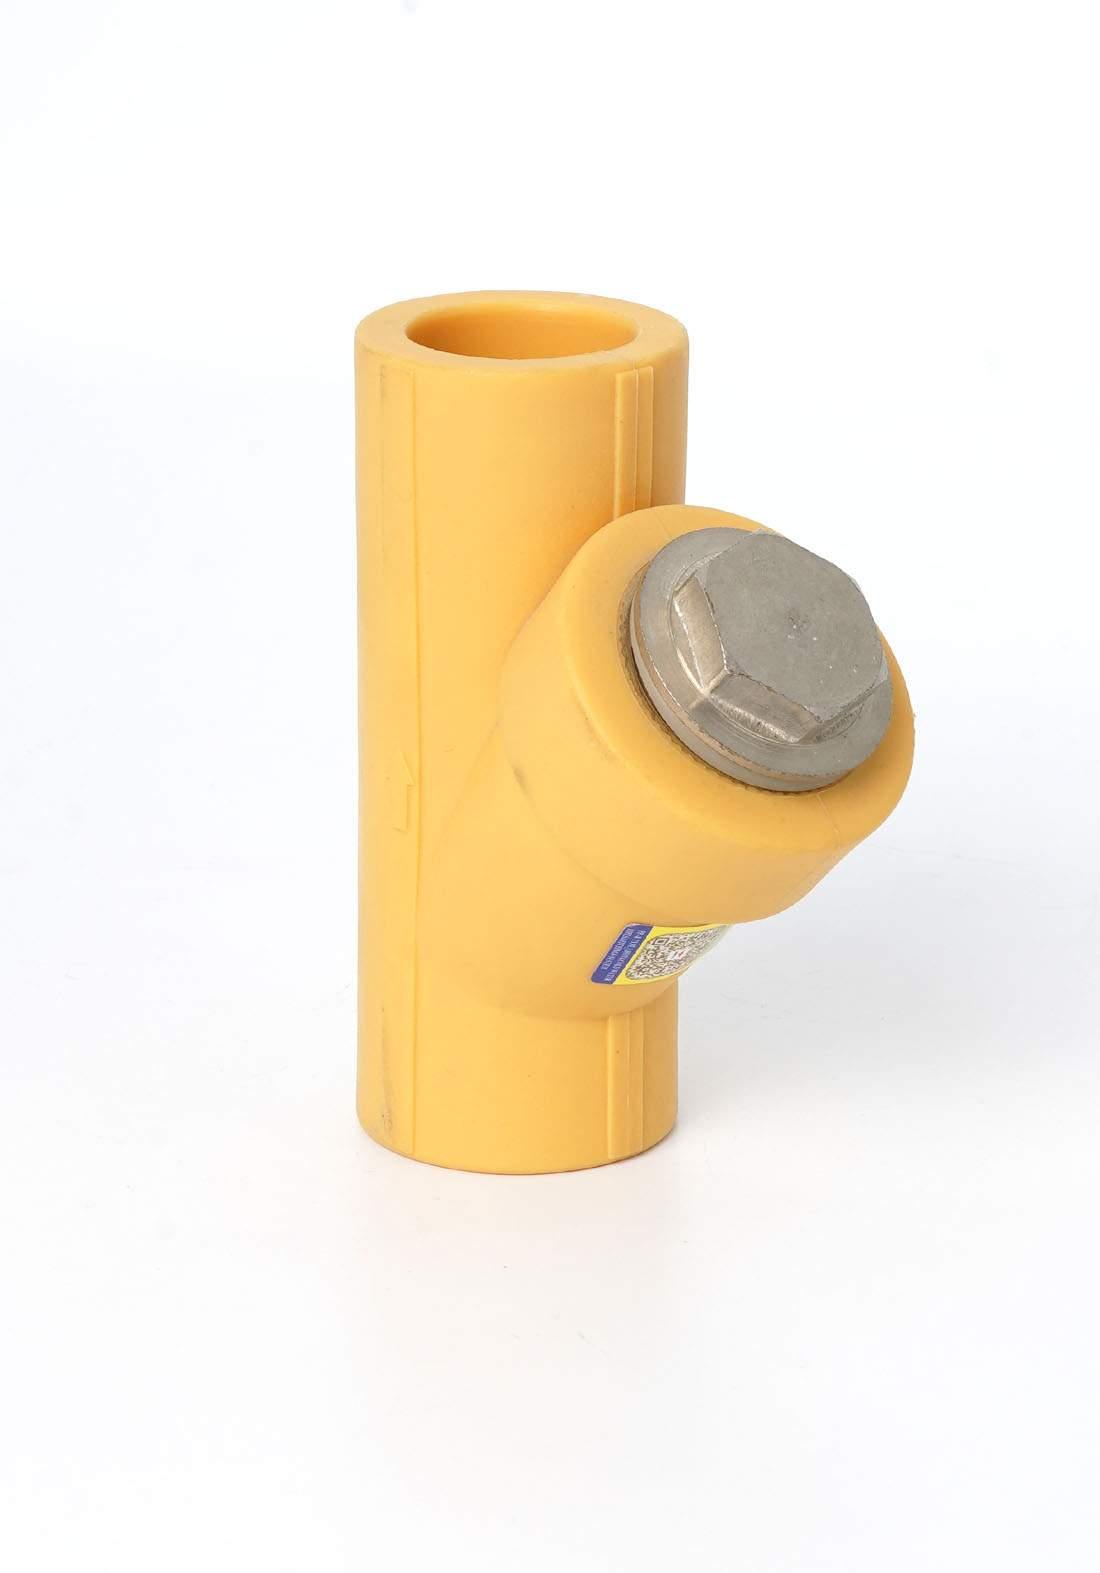 Wekts 5210 Splitting a advanced filter for pipes 32 mm تقسيم فلتر ماطور للأنابيب